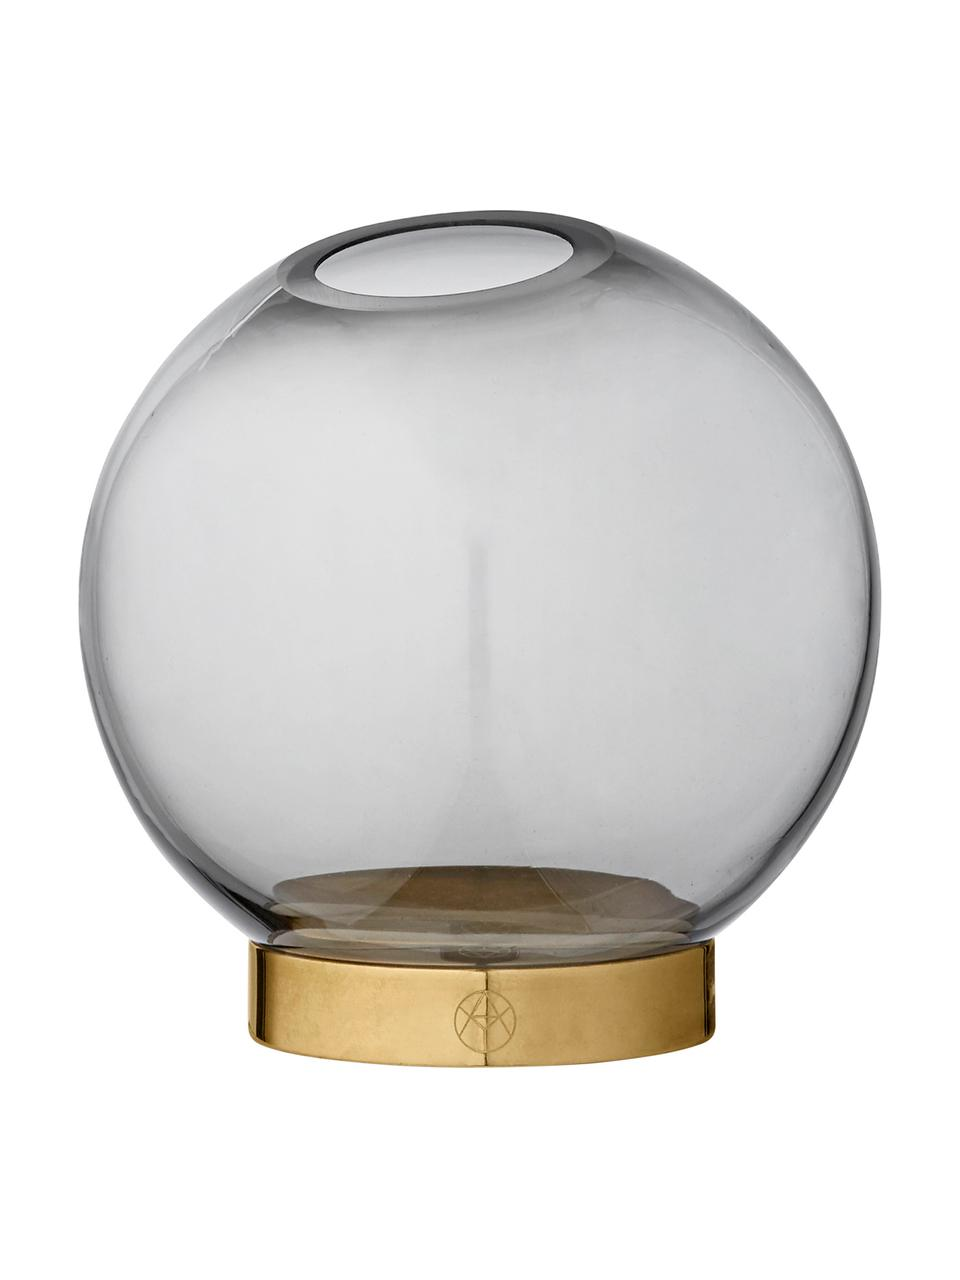 Kleine Glas-Vase Globe mit Metallsockel, Vase: Glas, Vase: Schwarz, transparent Fuß: Messing, Ø 10 x H 10 cm